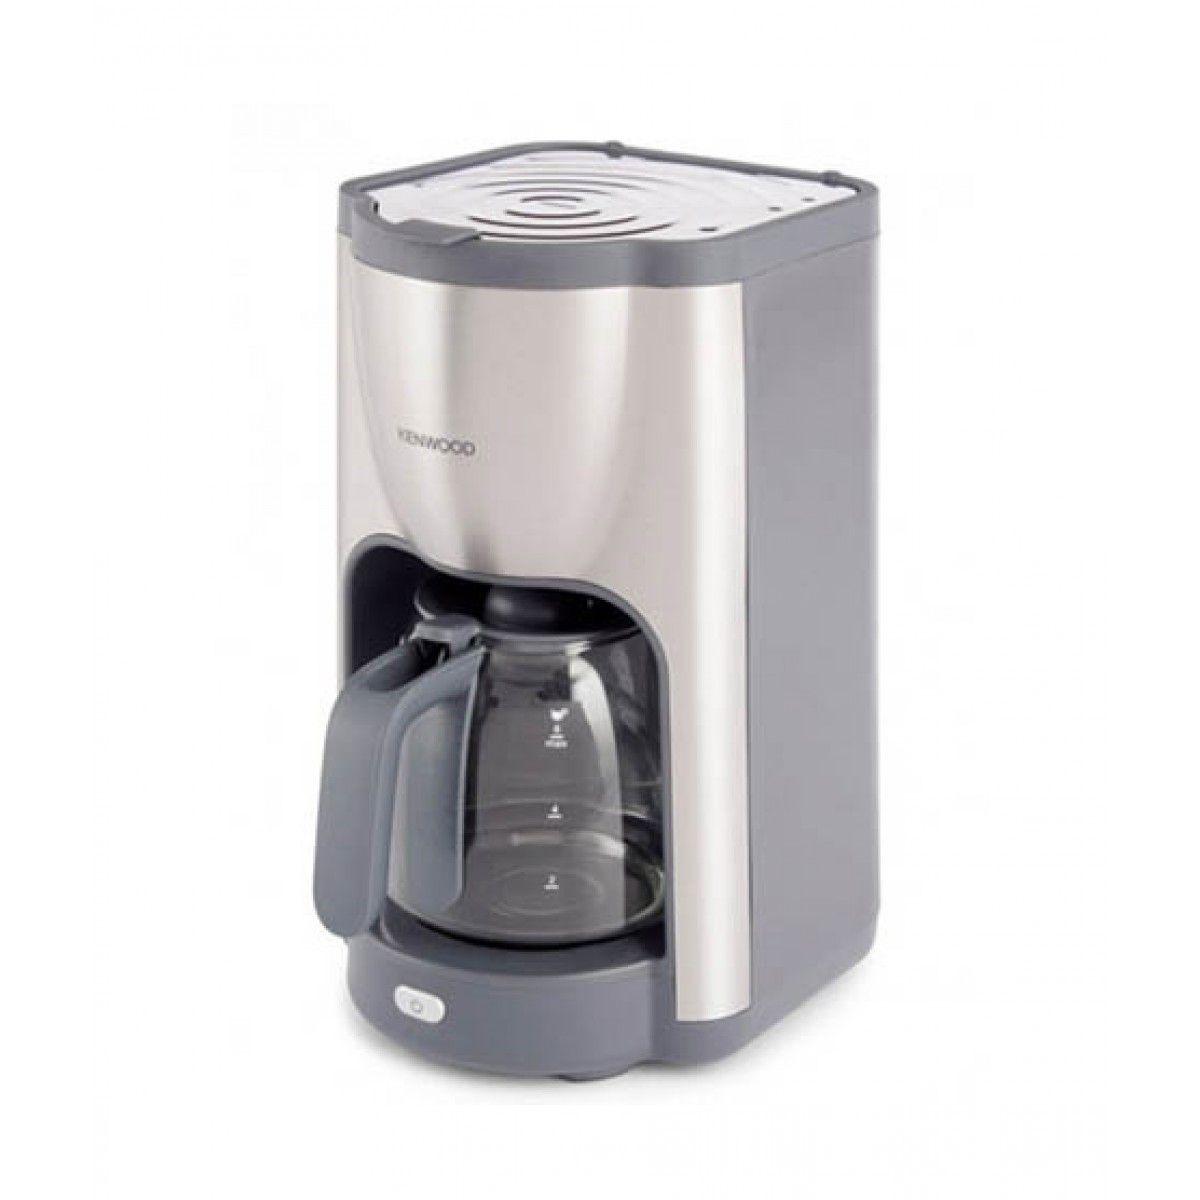 Kenwood CMM480 Coffee Maker